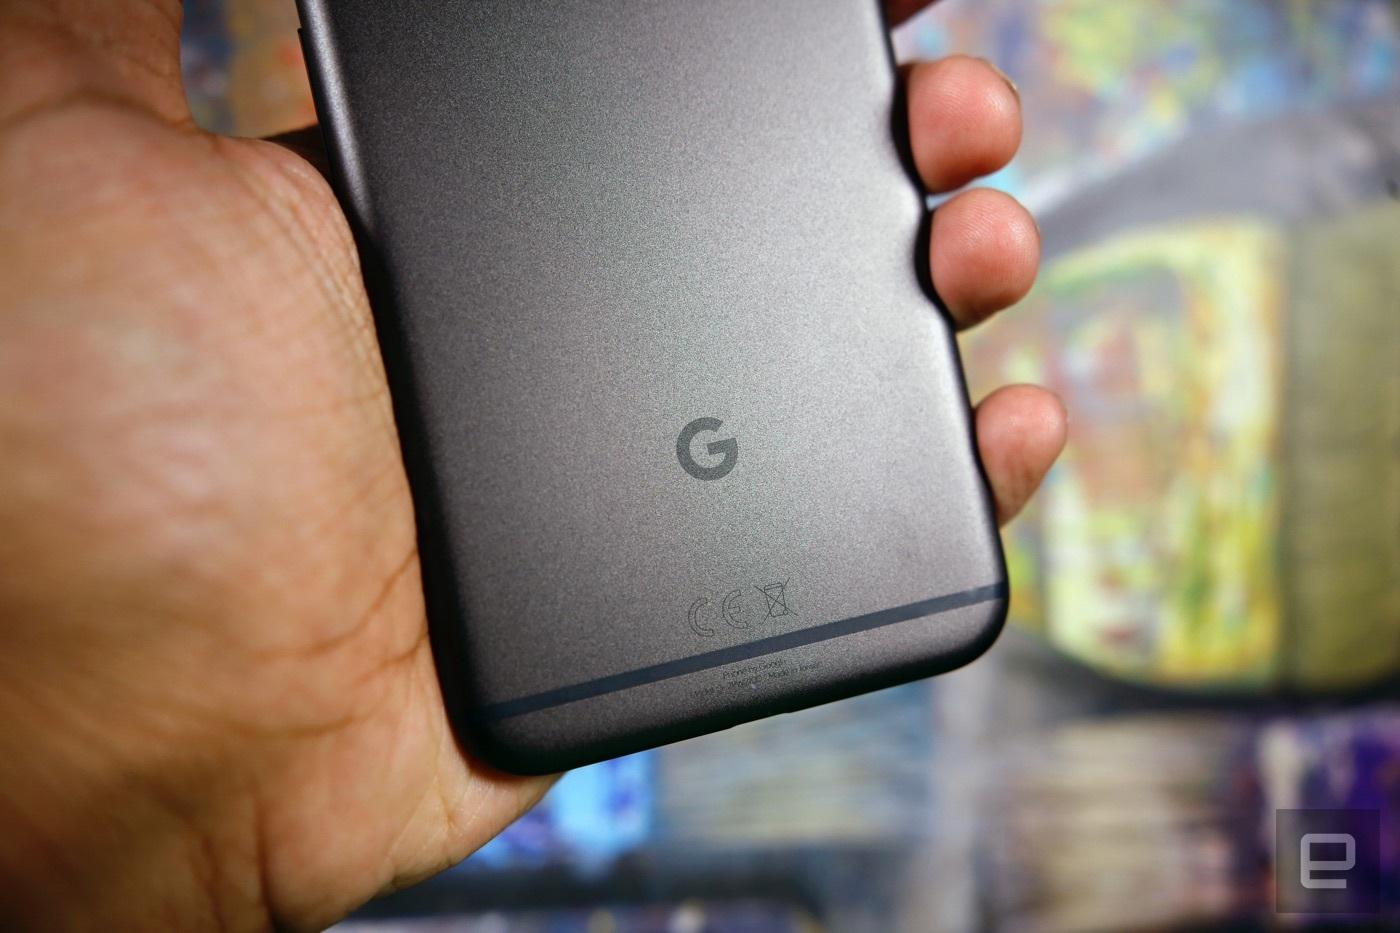 Google 的 Pixel 2 估計真的會支援 U11 那樣的擠壓操控